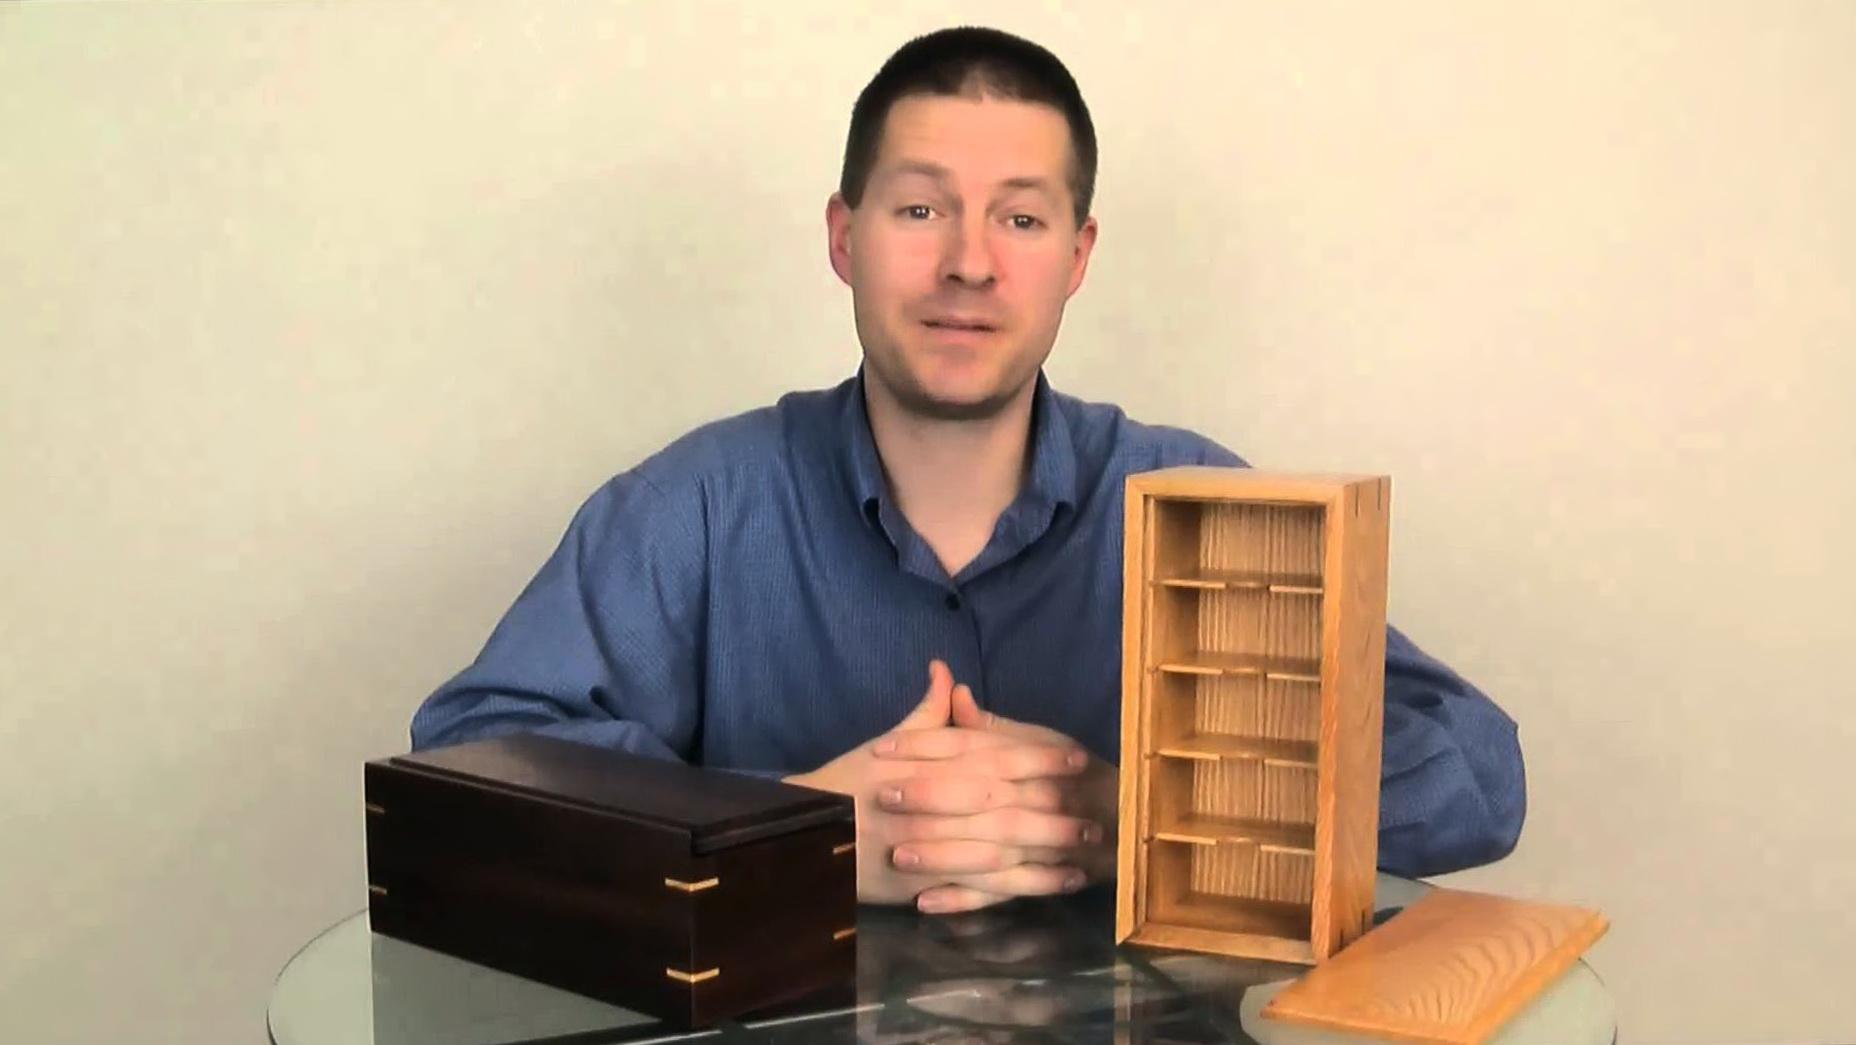 Magic The Gathering Custom Deck Box